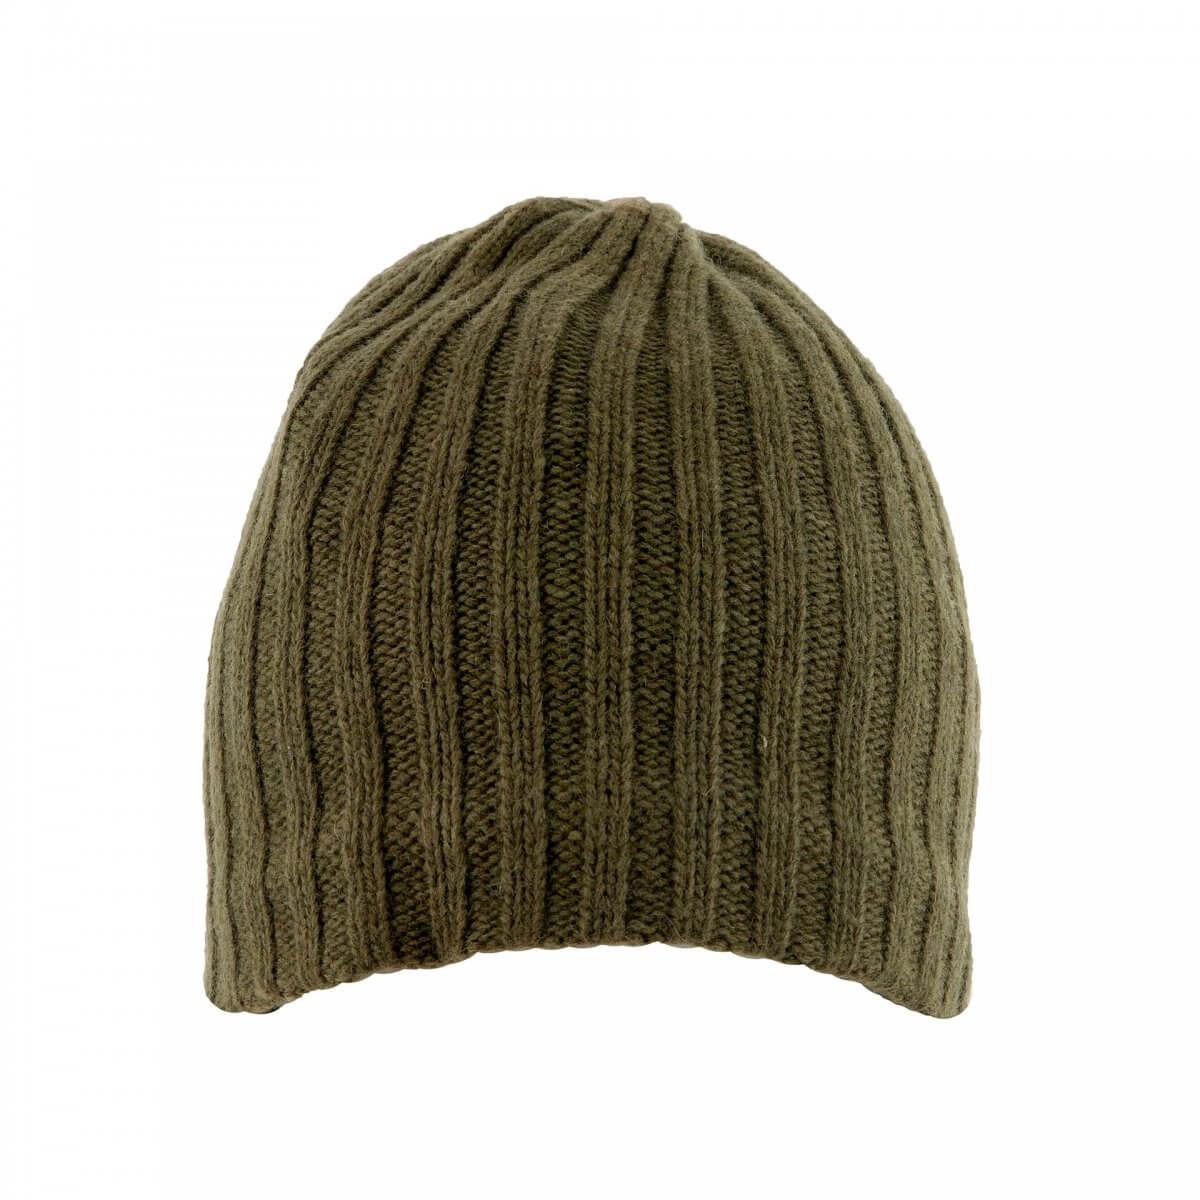 Wool Beanie Hat in Khaki Green